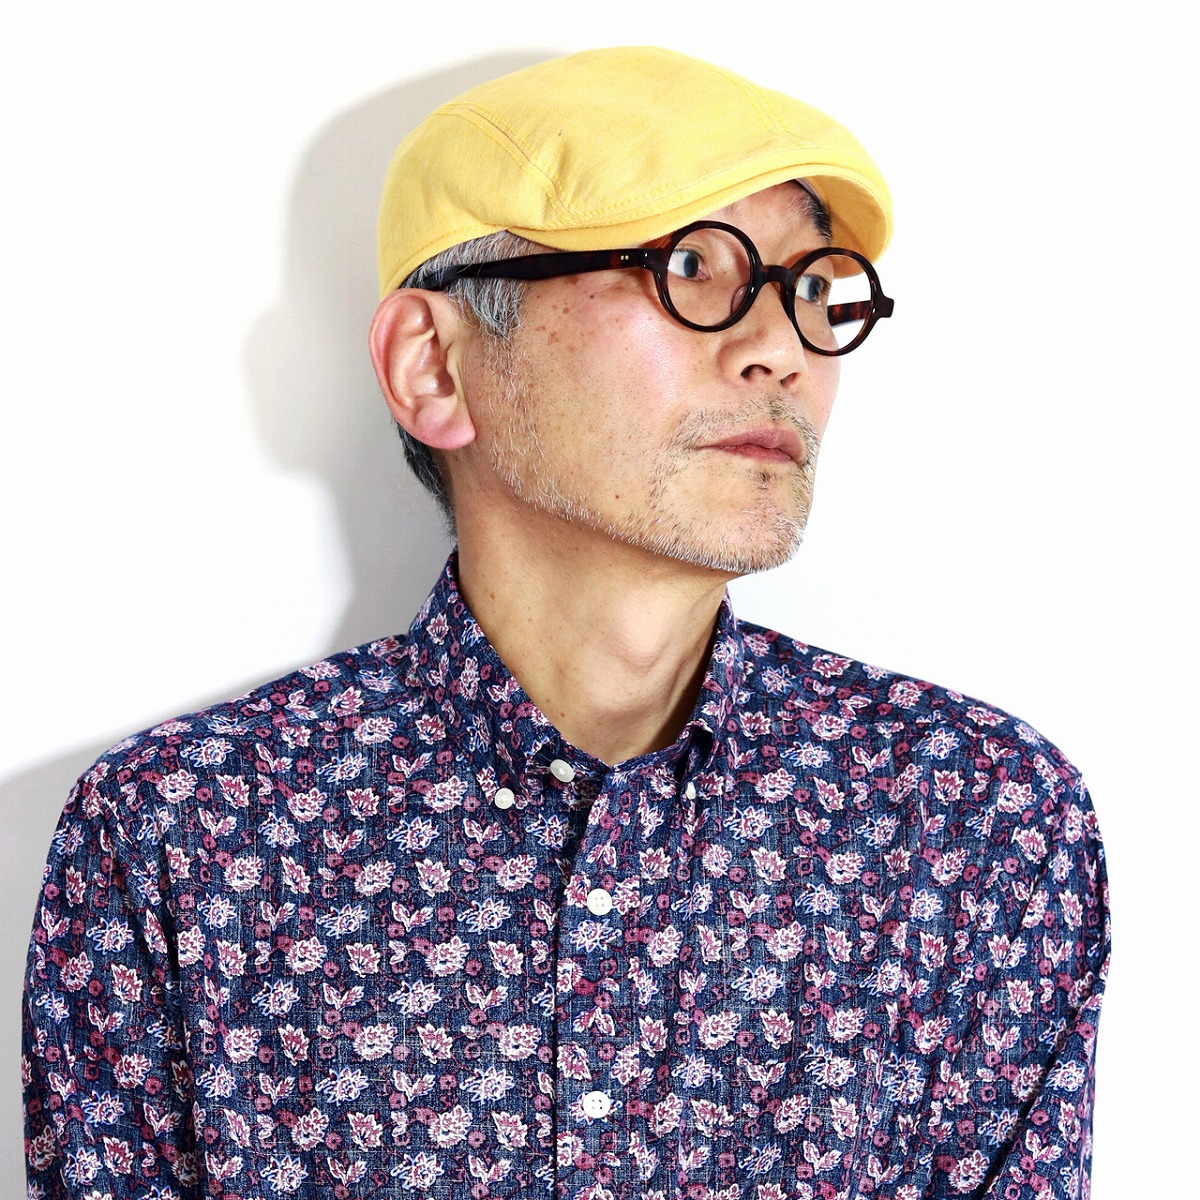 Gottmann 春 夏 メンズ 帽子 リネン100% UV40+ 日焼け対策 アウトドア ゴットマン ハンチング 麻 大きいサイズ 57cm 58cm 60cm 62cm 64cm シンプル 無地 UVプロテクト アイビーキャップ 黄色 イエロー [ ivy cap ] 父の日 ギフト プレゼント 帽子通販 男性 プレゼント